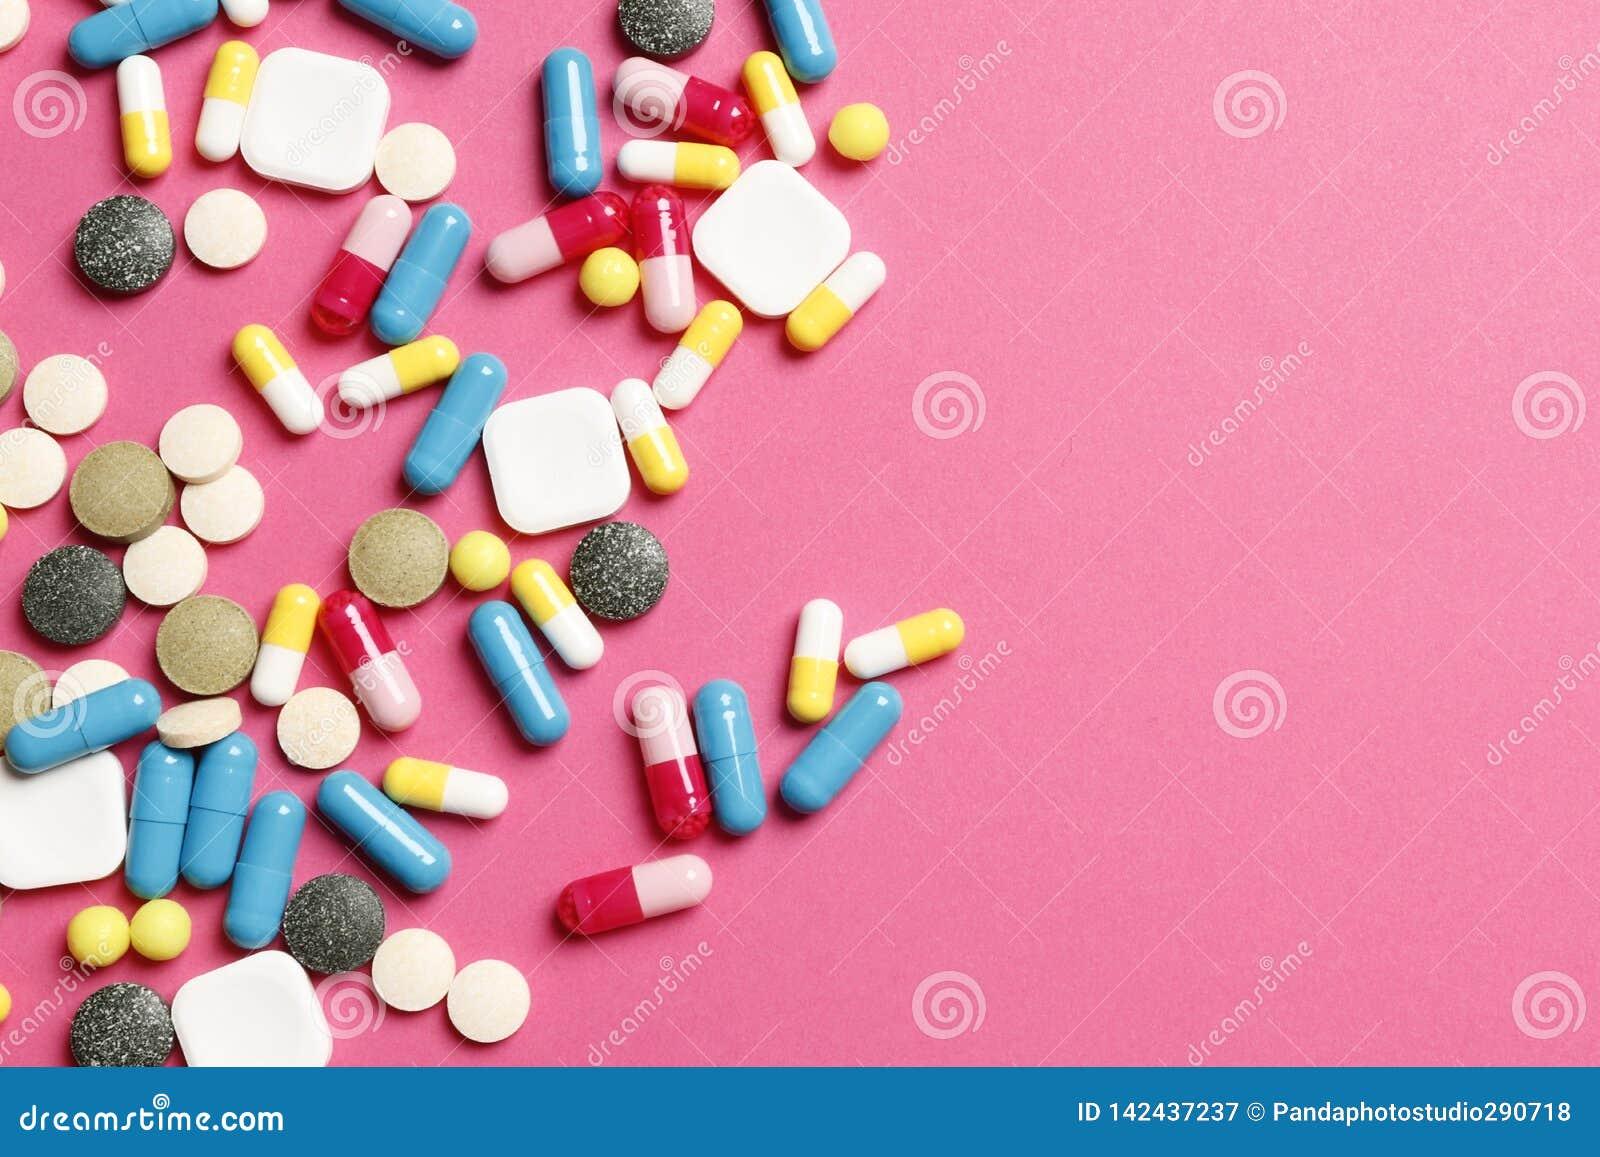 Vitamines multicolores sur un fond rose